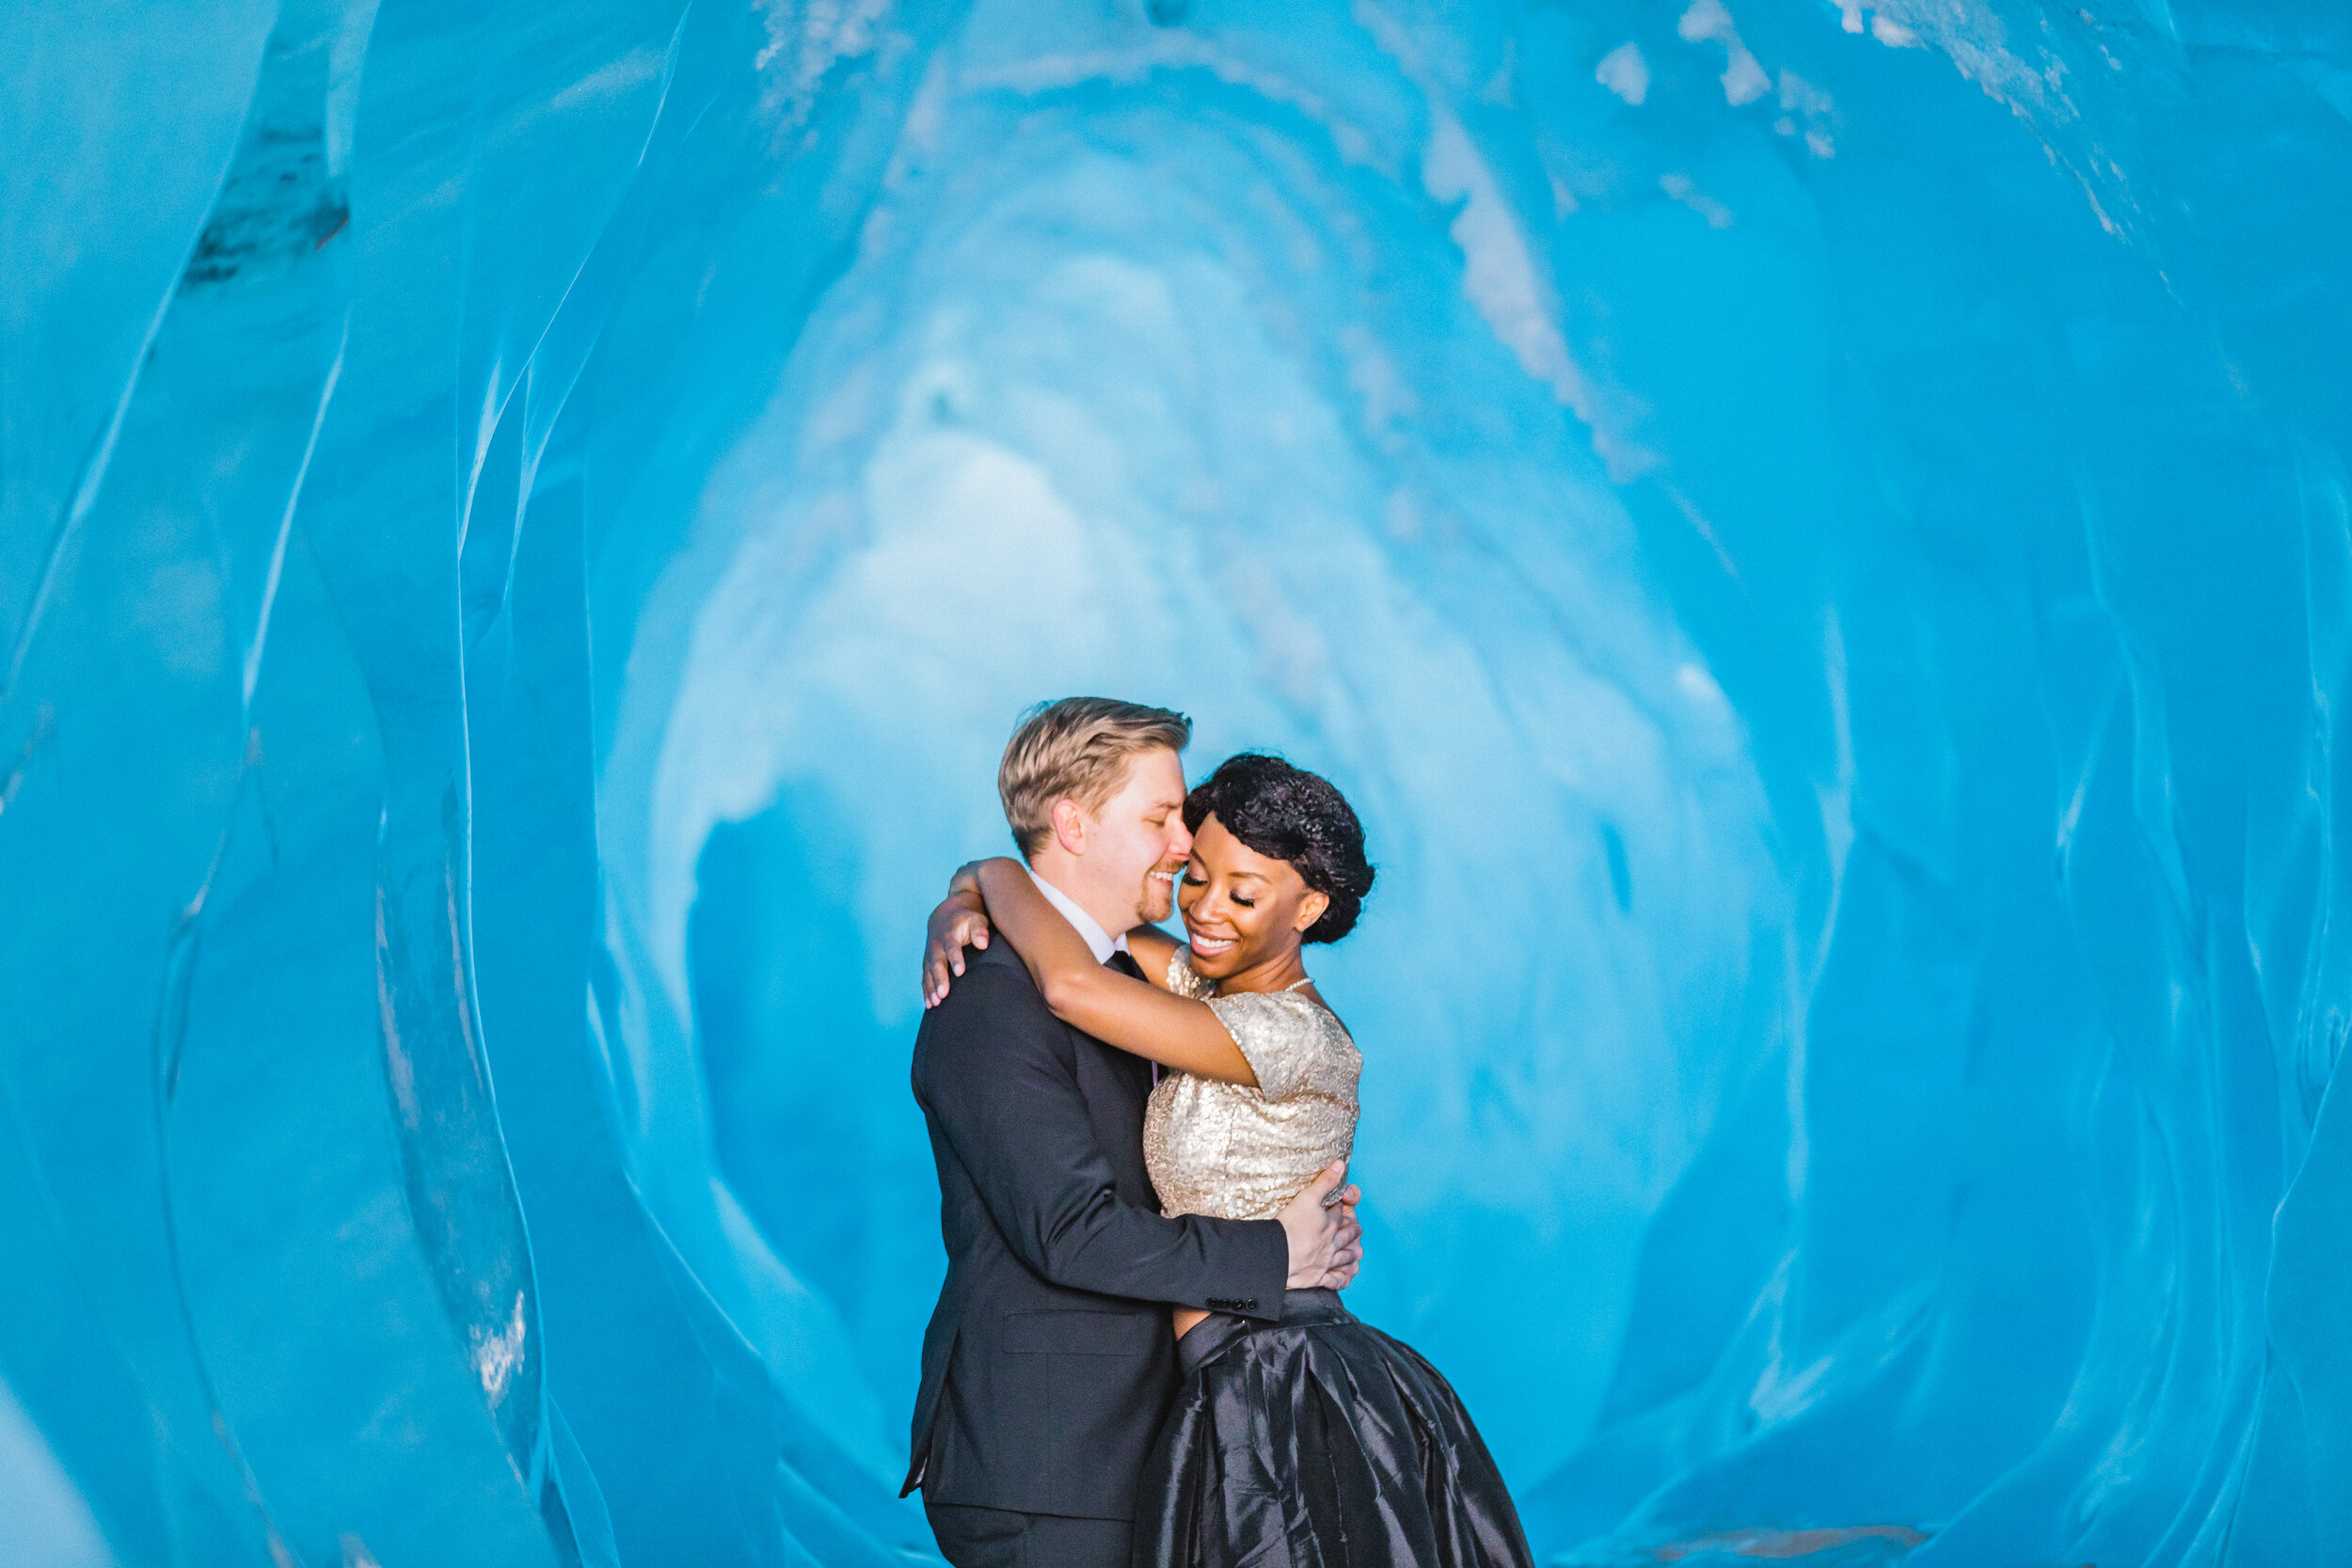 Engagement_Session_Matanuska_Glacier_Alaska_Emily_Lester_Photography-82.jpg